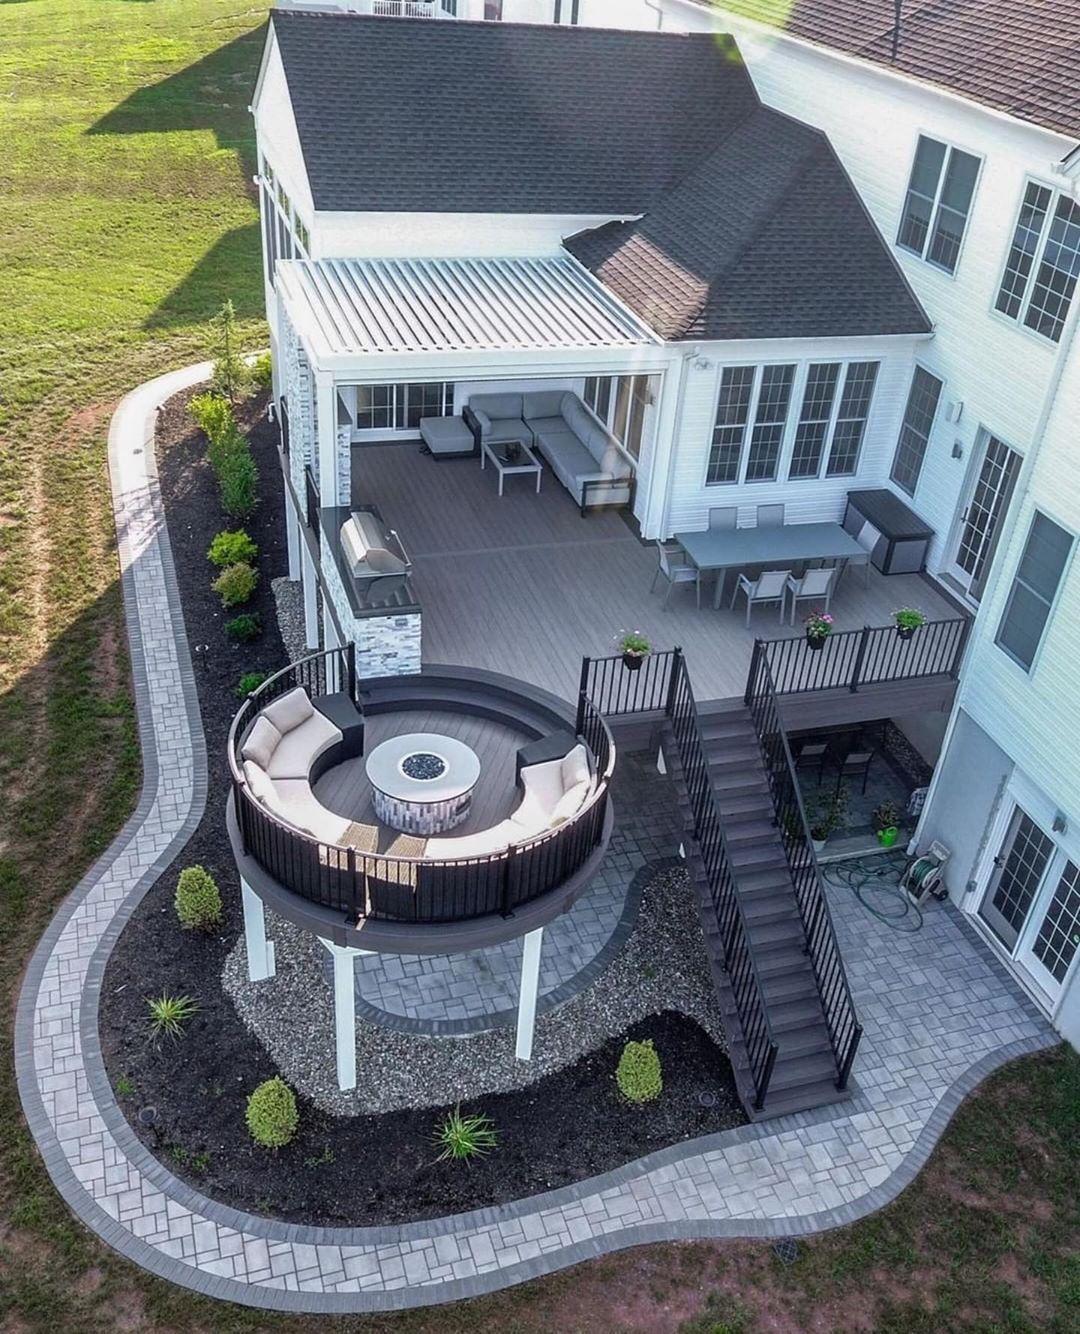 20 Modern Summer Backyard Decorating Ideas For Enjoy Holiday Season In 2020 House Exterior Modern House Design House Designs Exterior